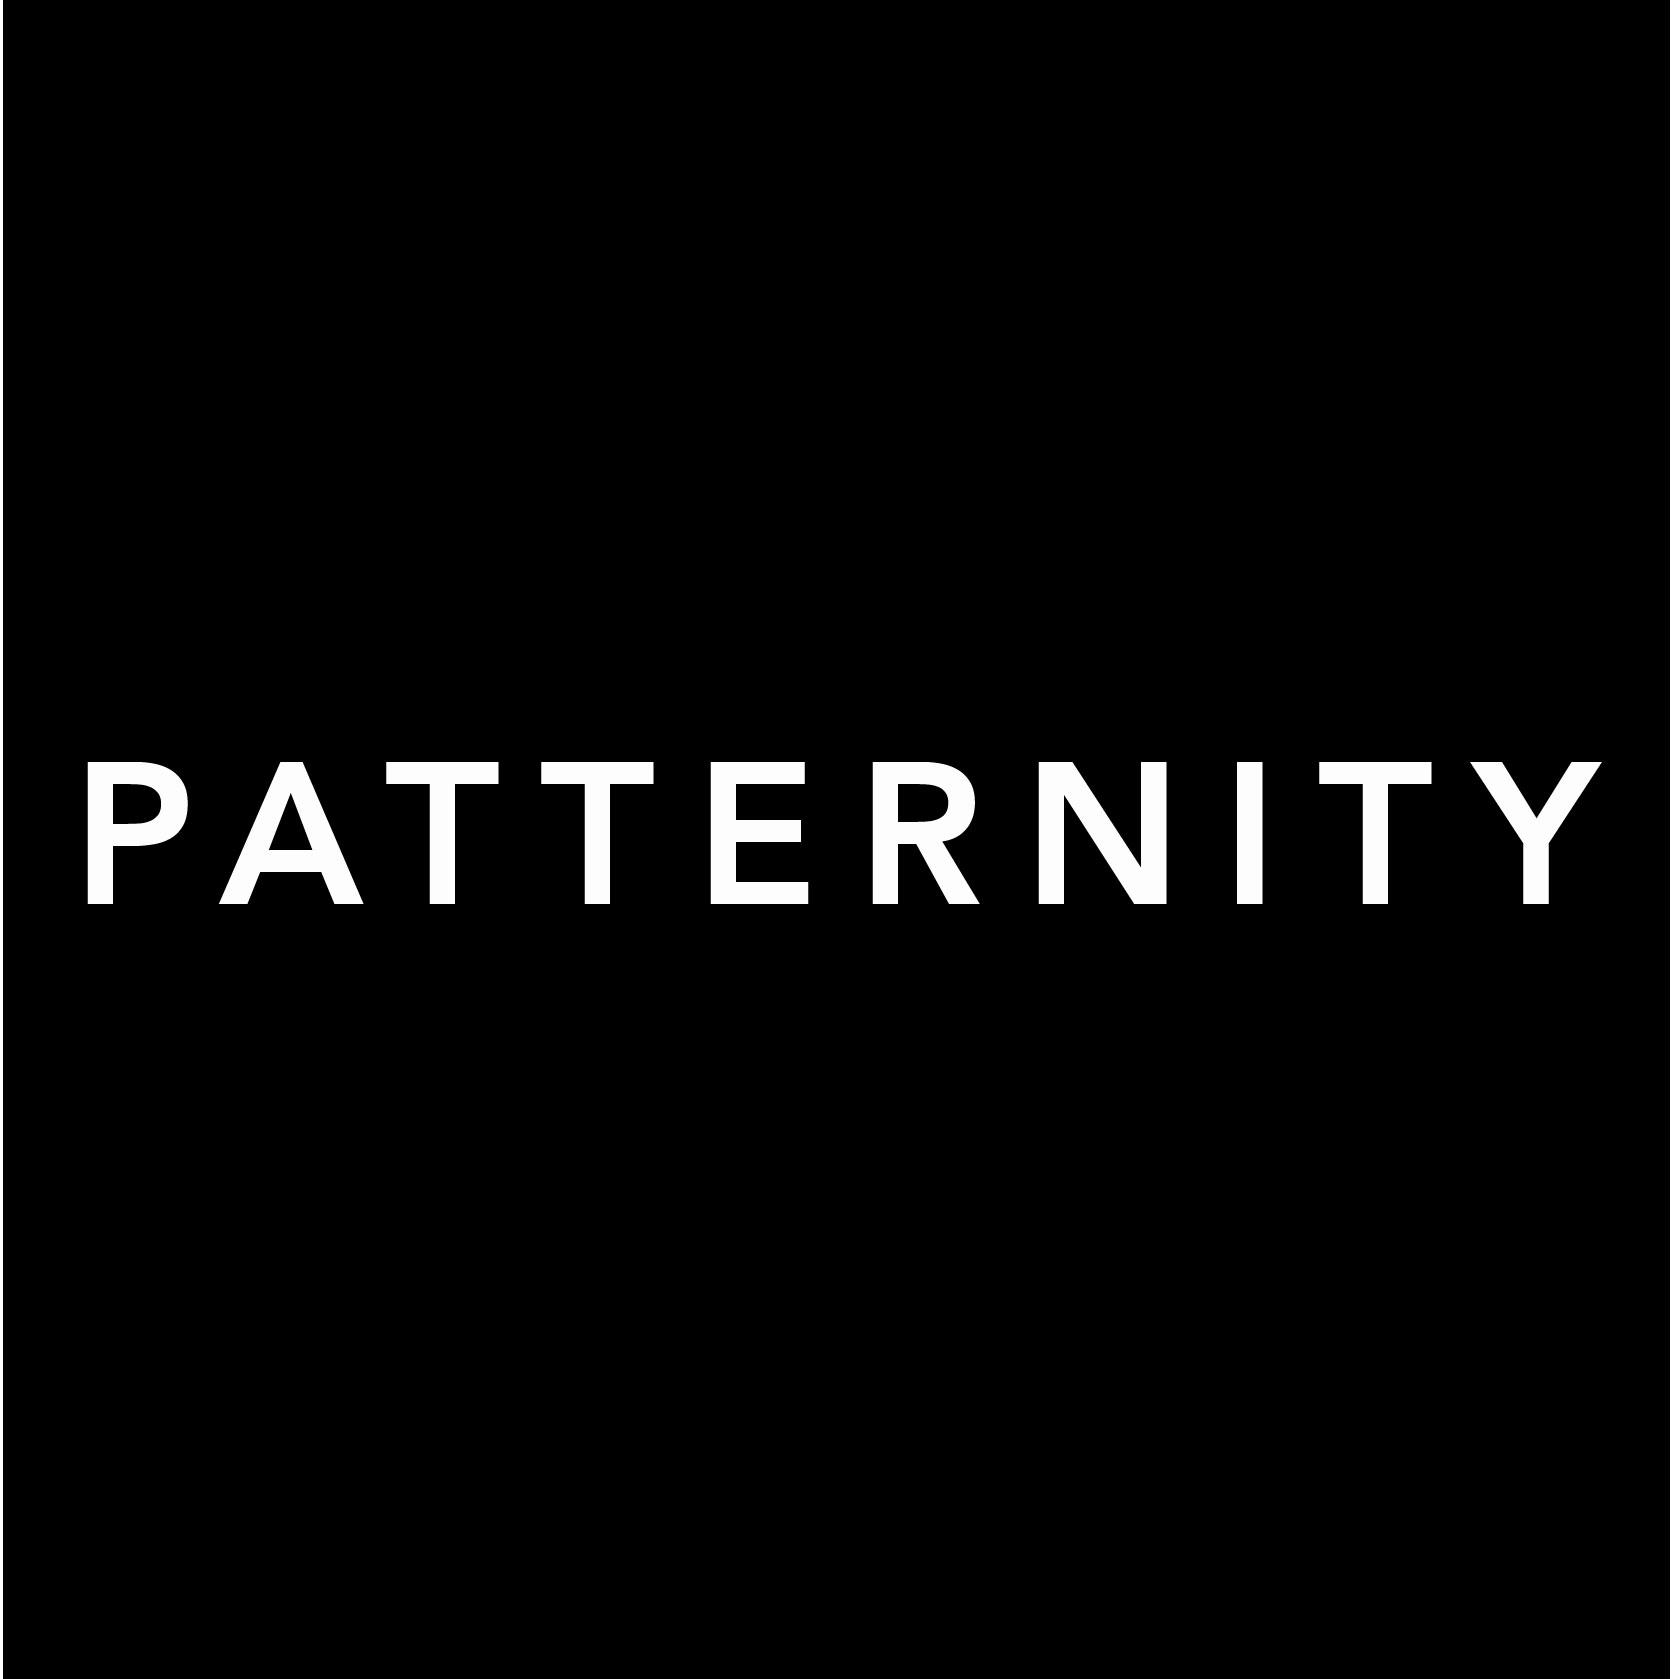 PATTERNITY_Black.jpg